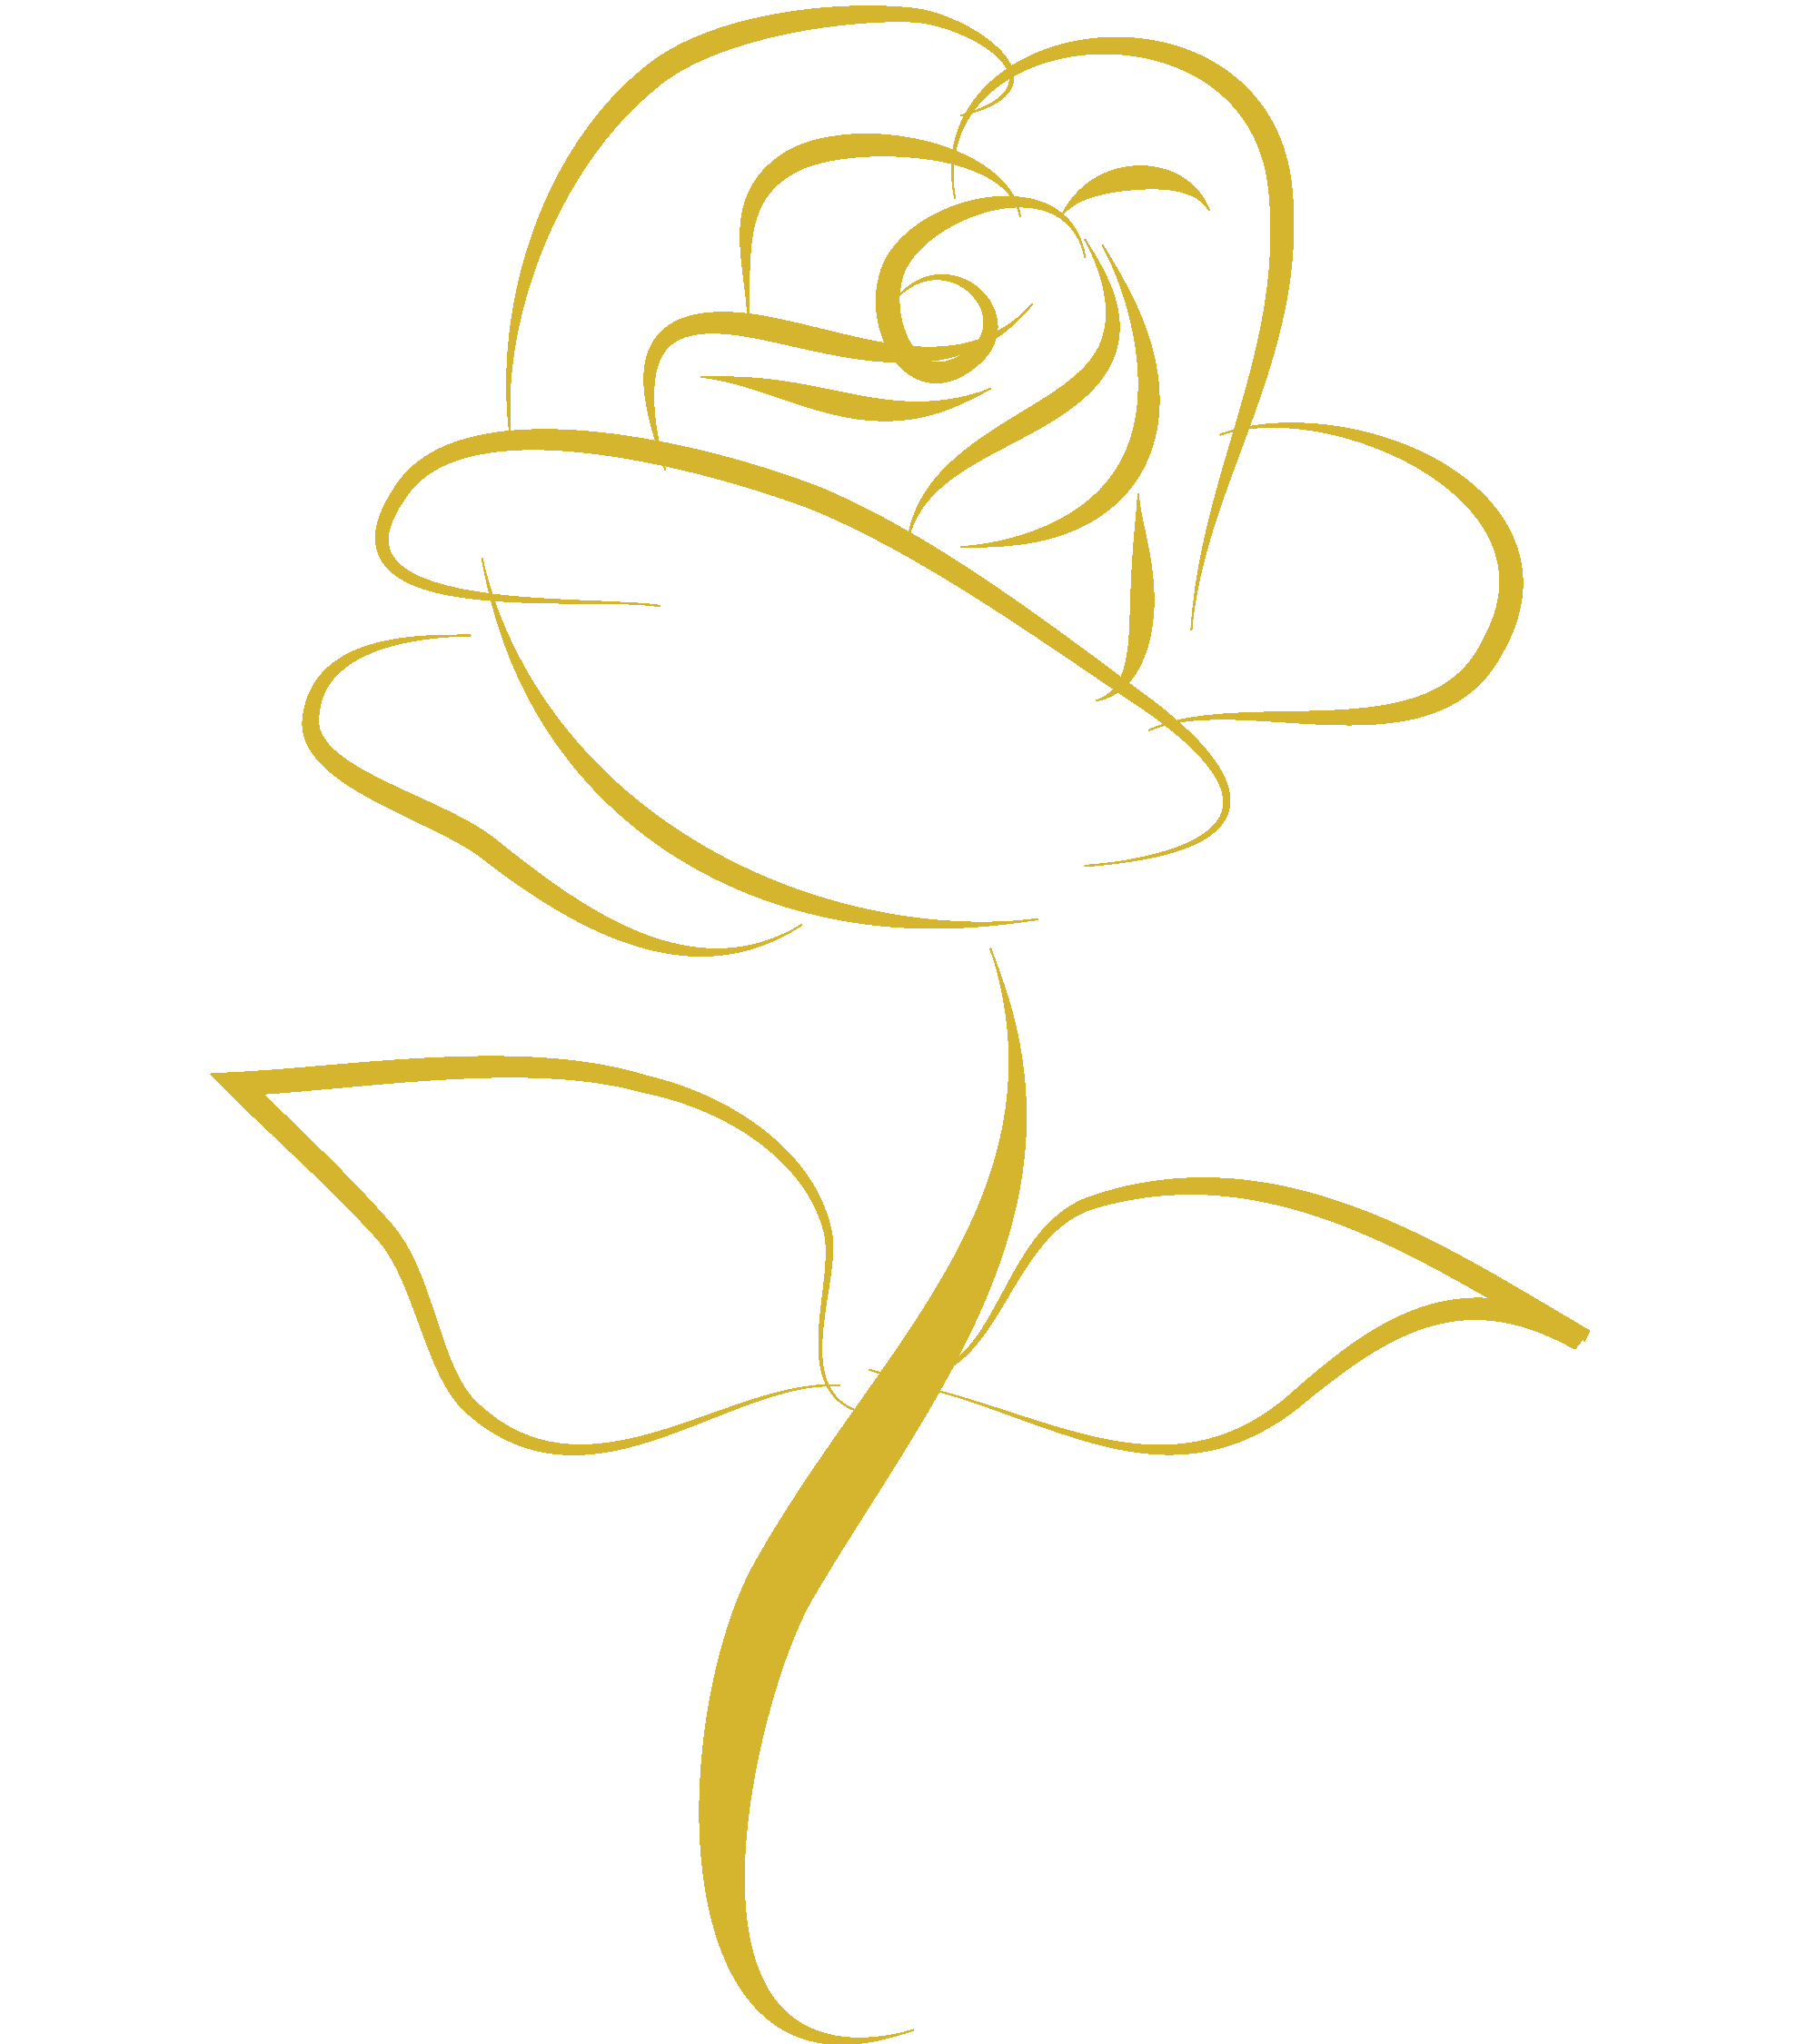 Clipart rose rose gold, Clipart rose rose gold Transparent.